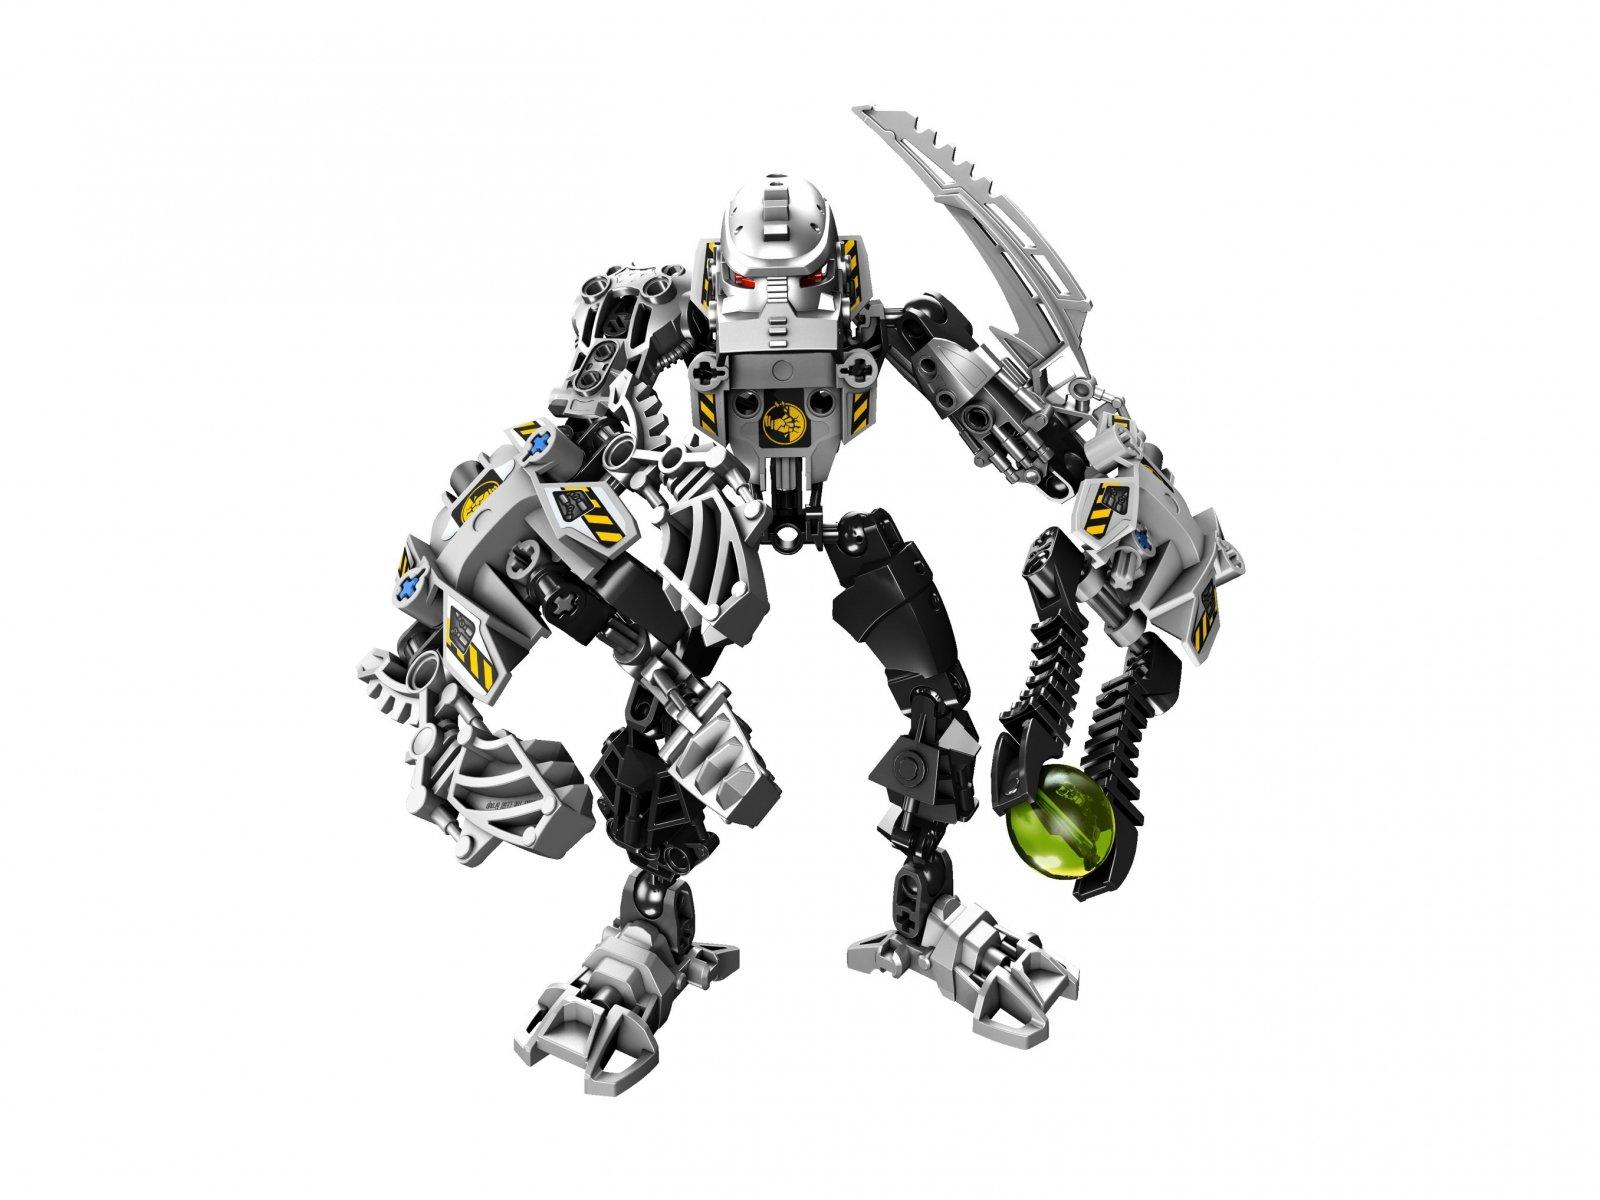 LEGO 7157 Grom